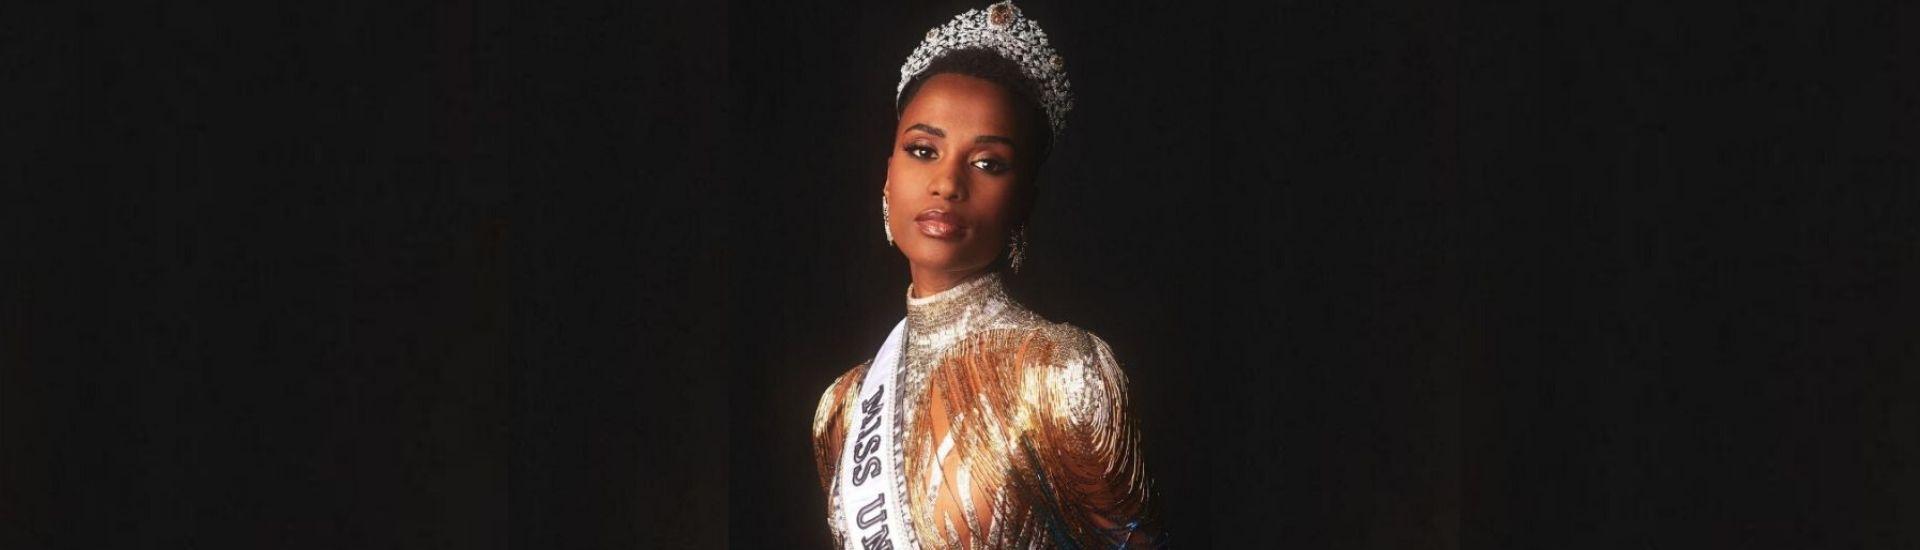 Zozibini Tunzi, 26 ans, Sud-africaine, Miss Univers 2019